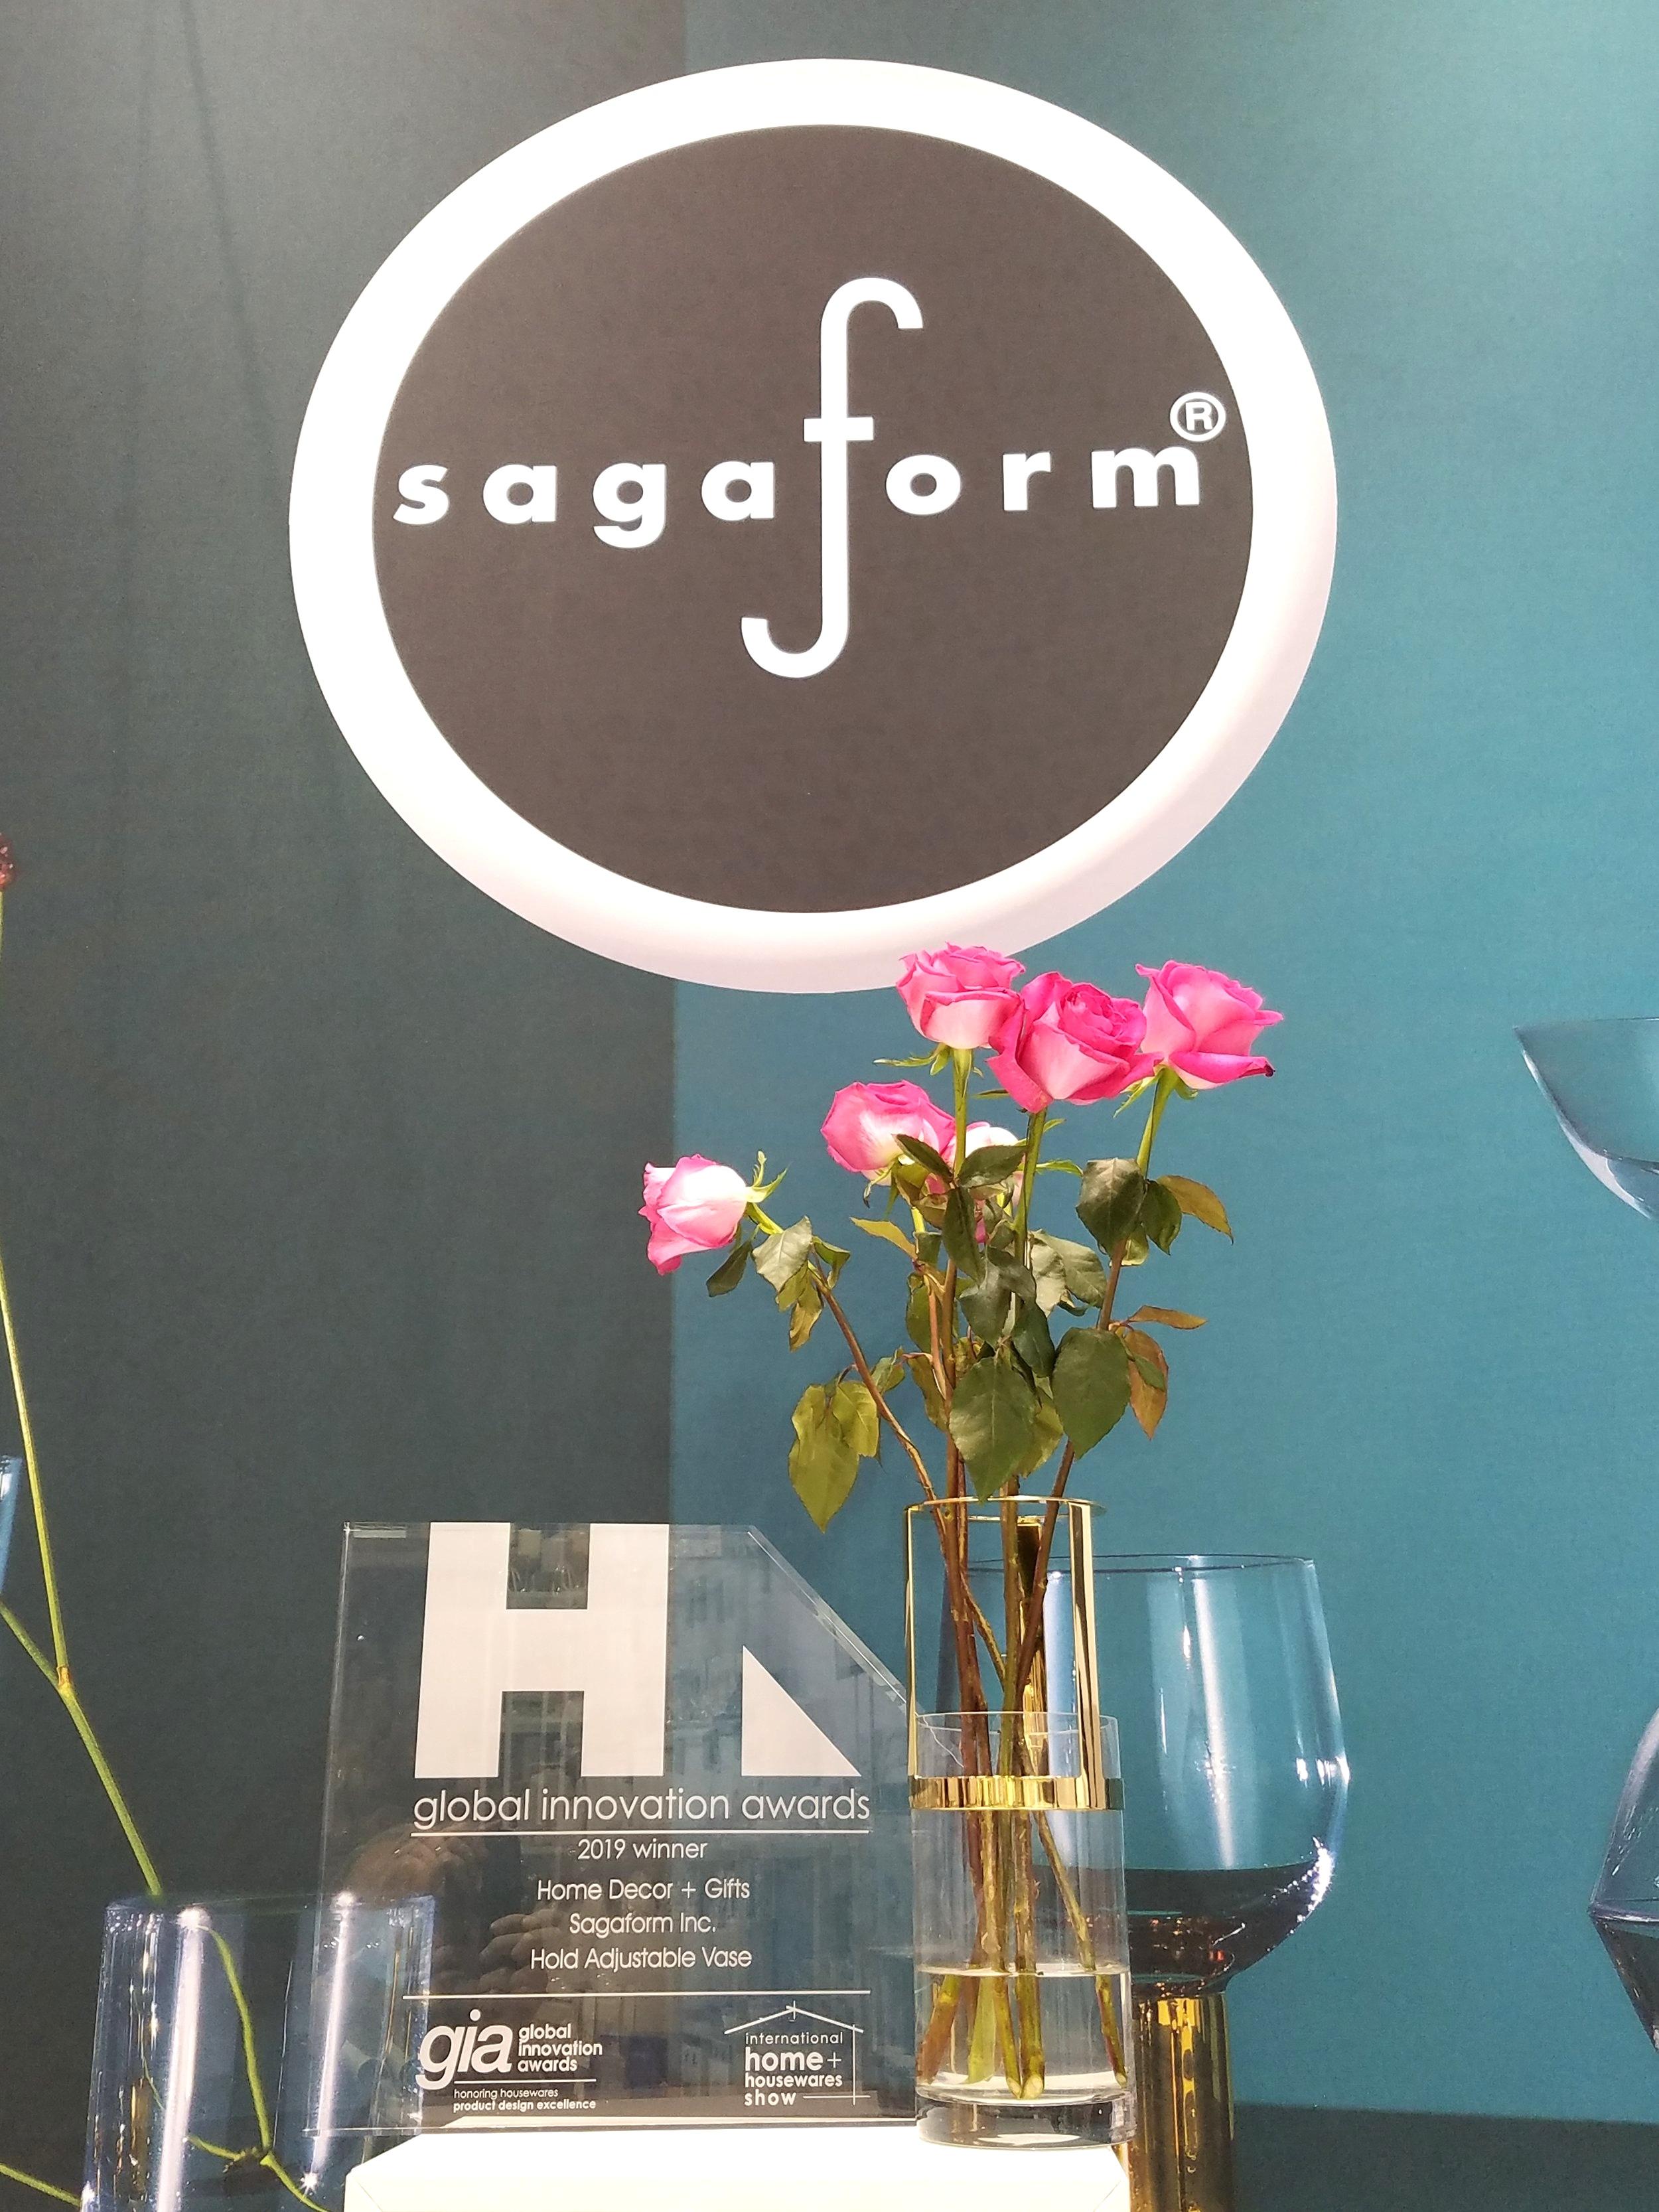 GIA+award+w+sagaform+logo+3.jpg